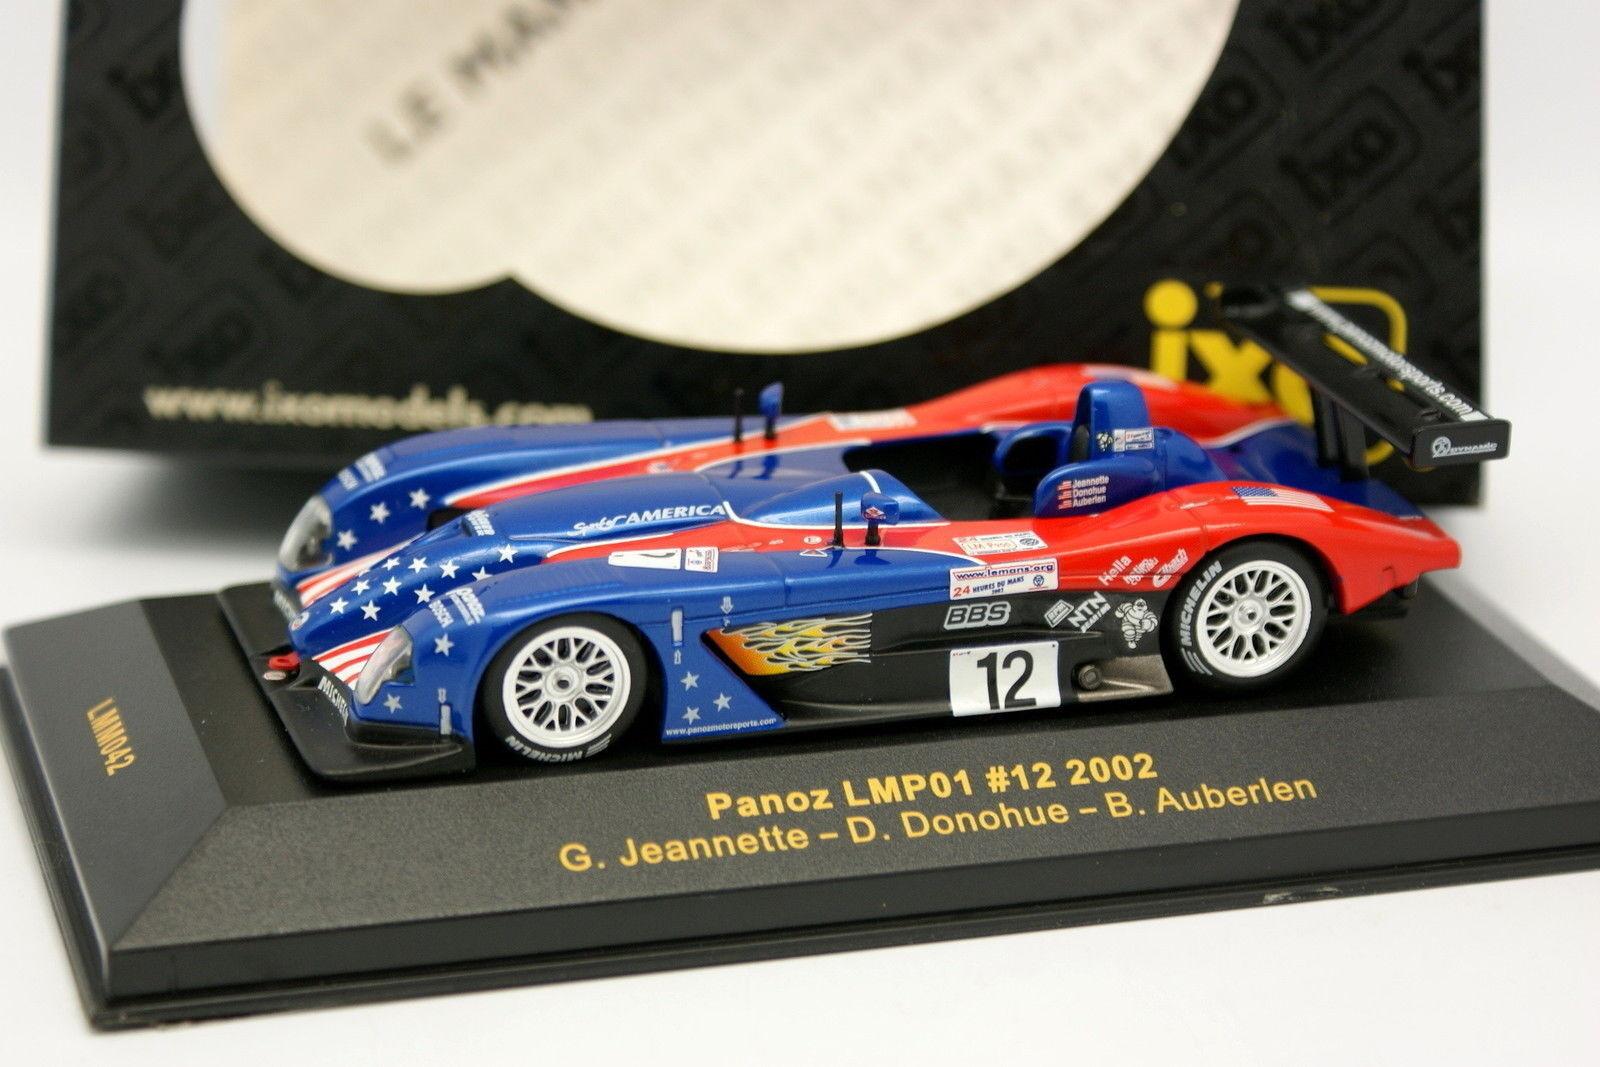 Ixo 1 43 - Panoz LMP01 Nº12 Le Mans 2002